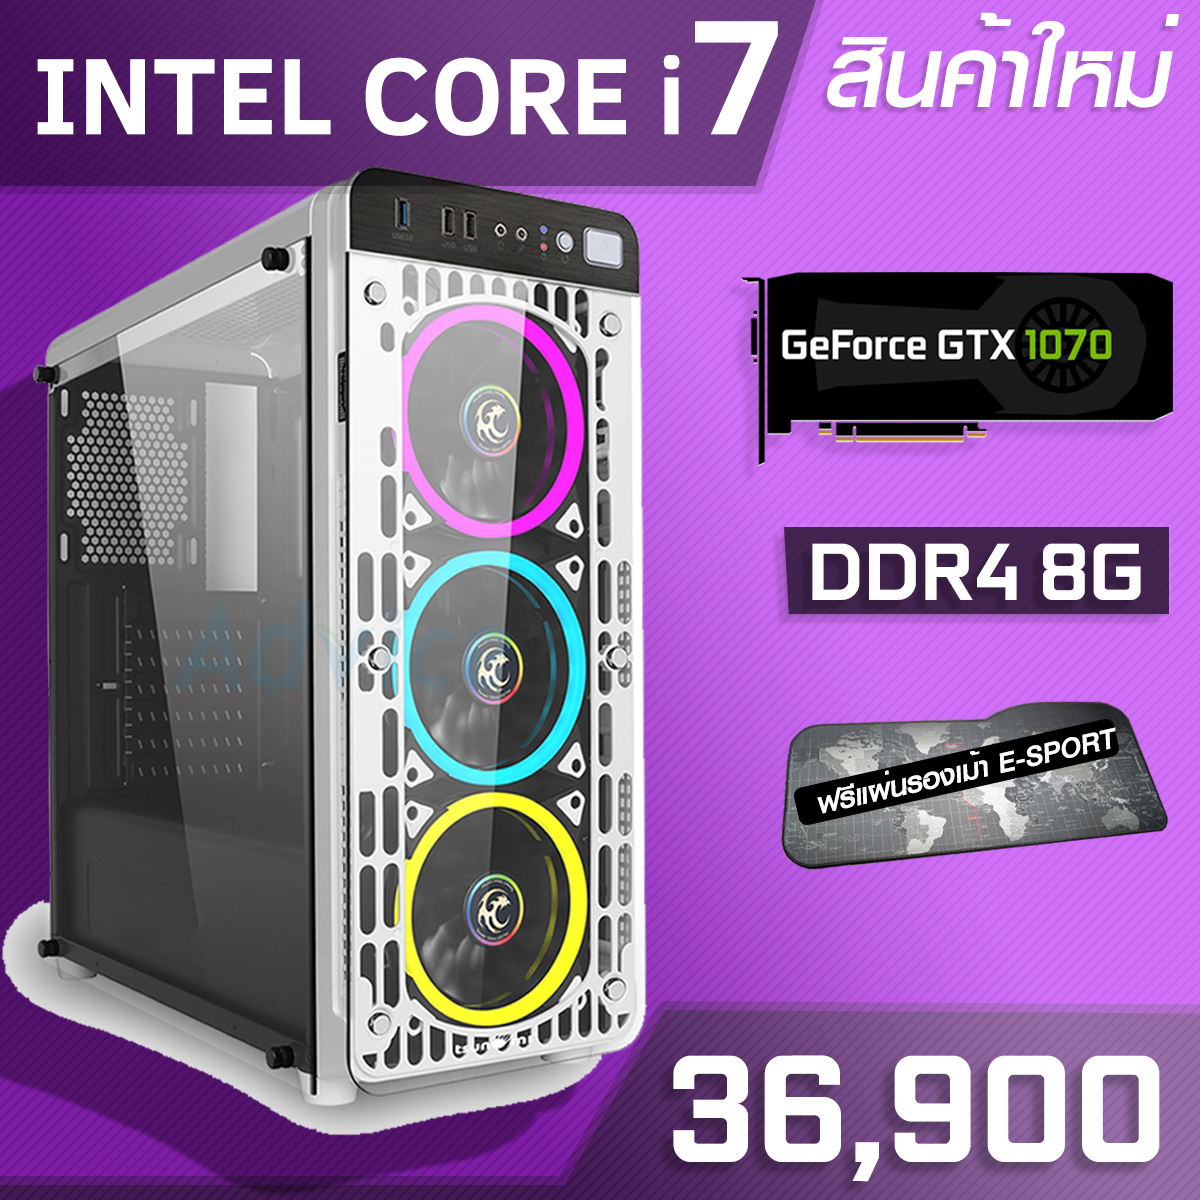 GEN 8 CORE i7-8700 | DDR4 BUS 2400 8G | GTX1070 | 1TB 7200RPM